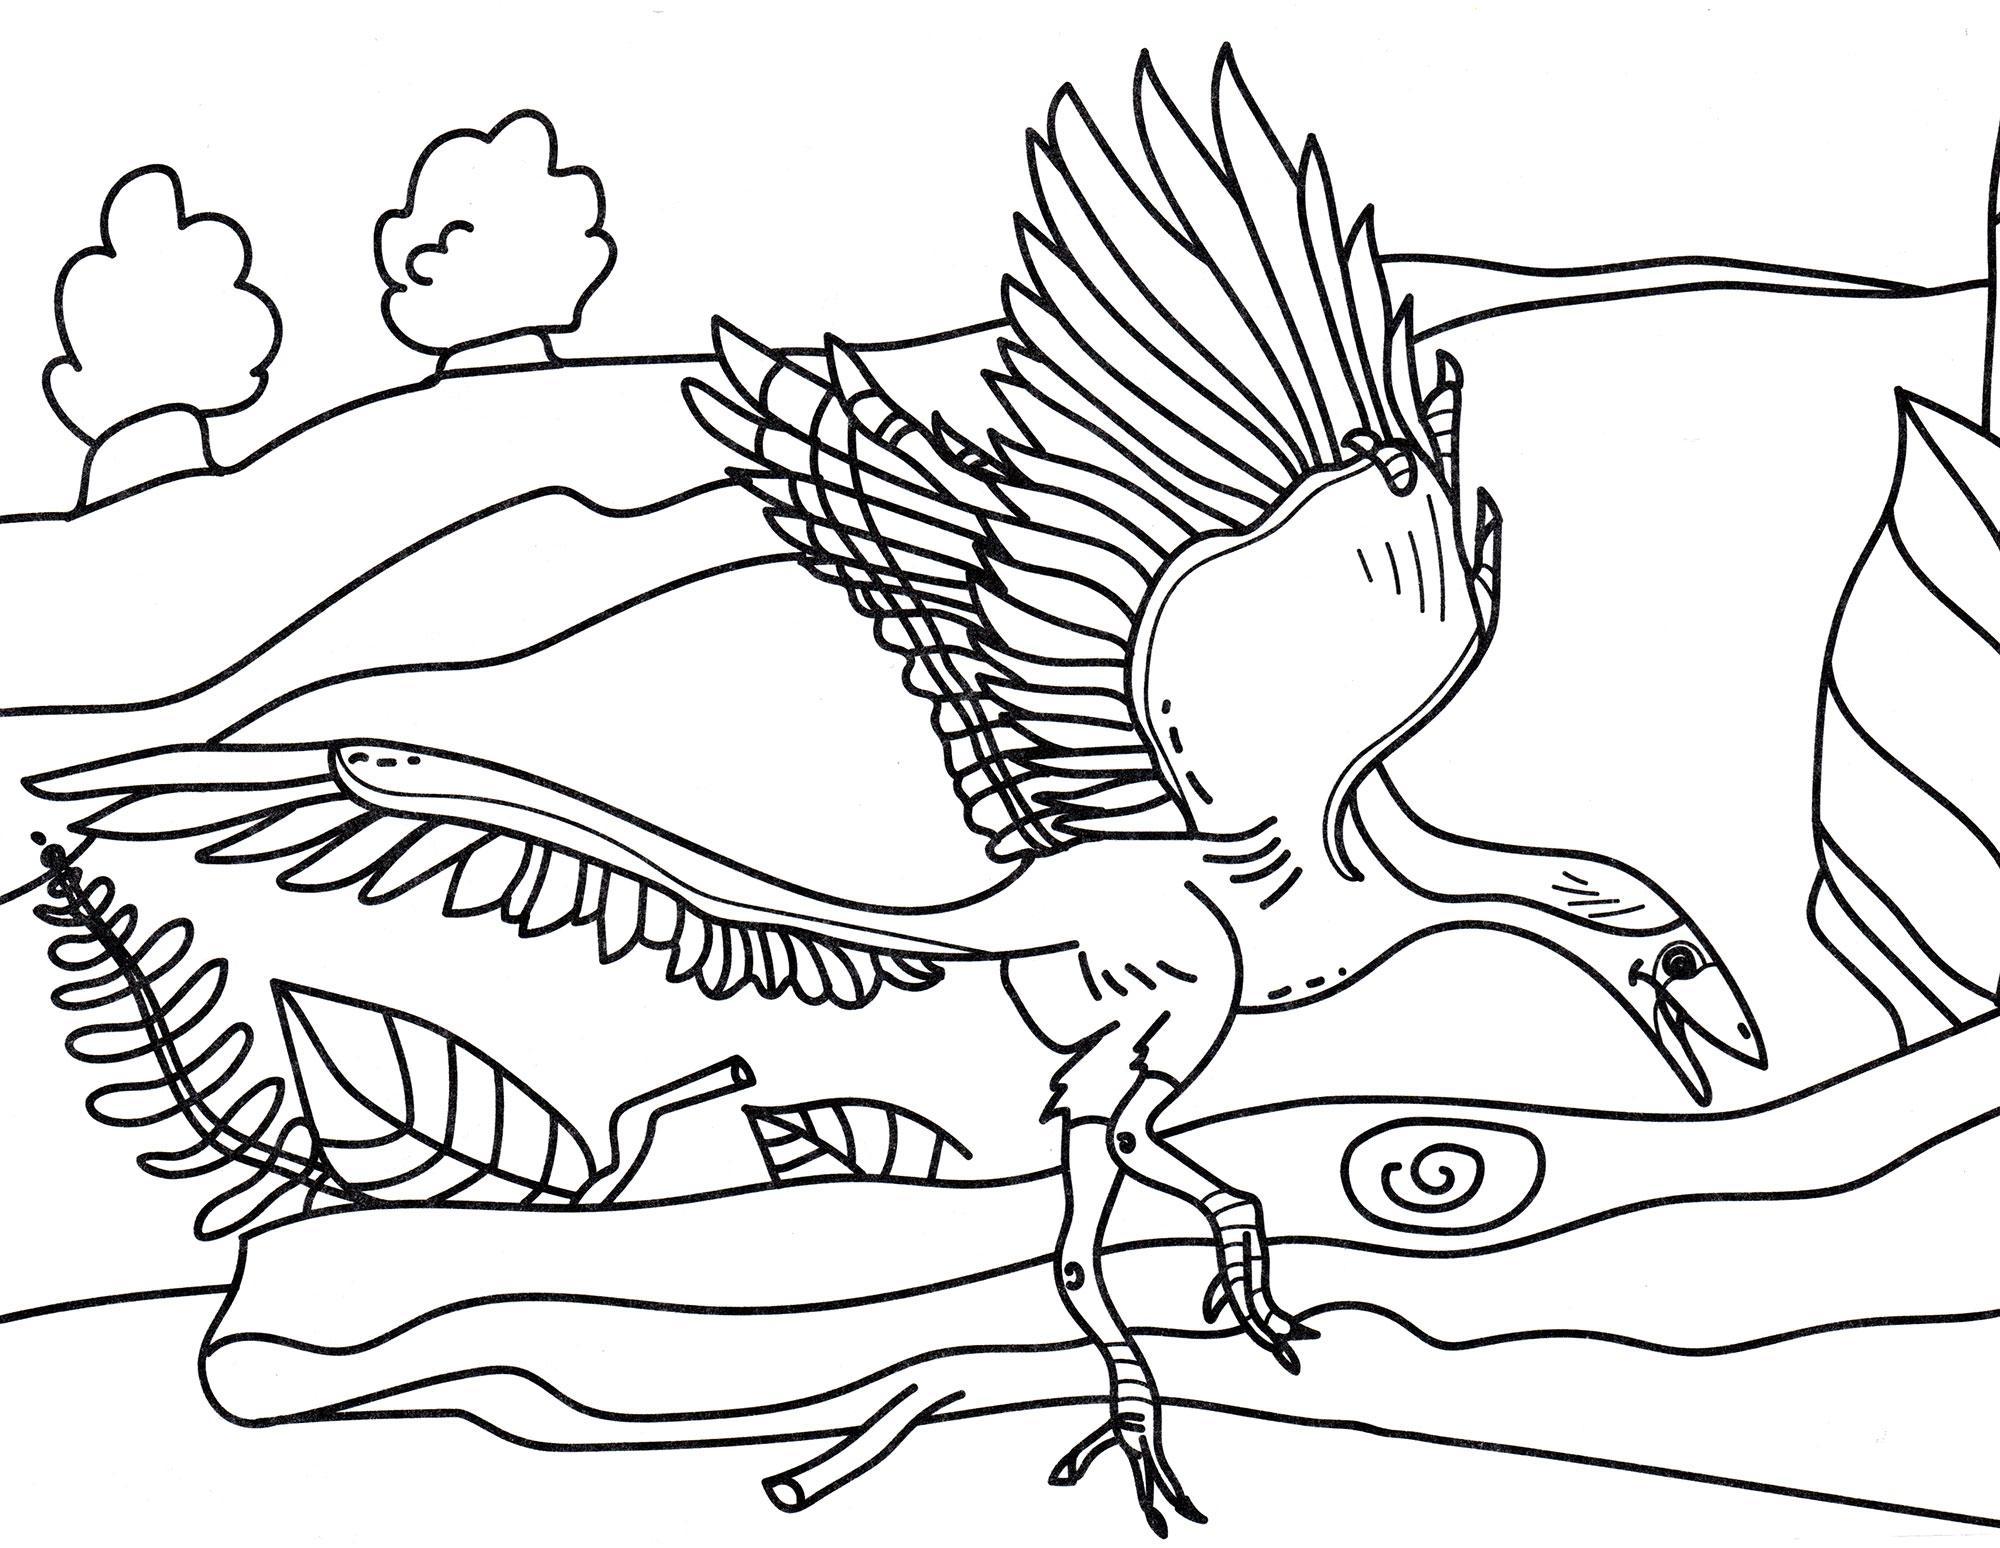 раскраска динозавр археоптерикс